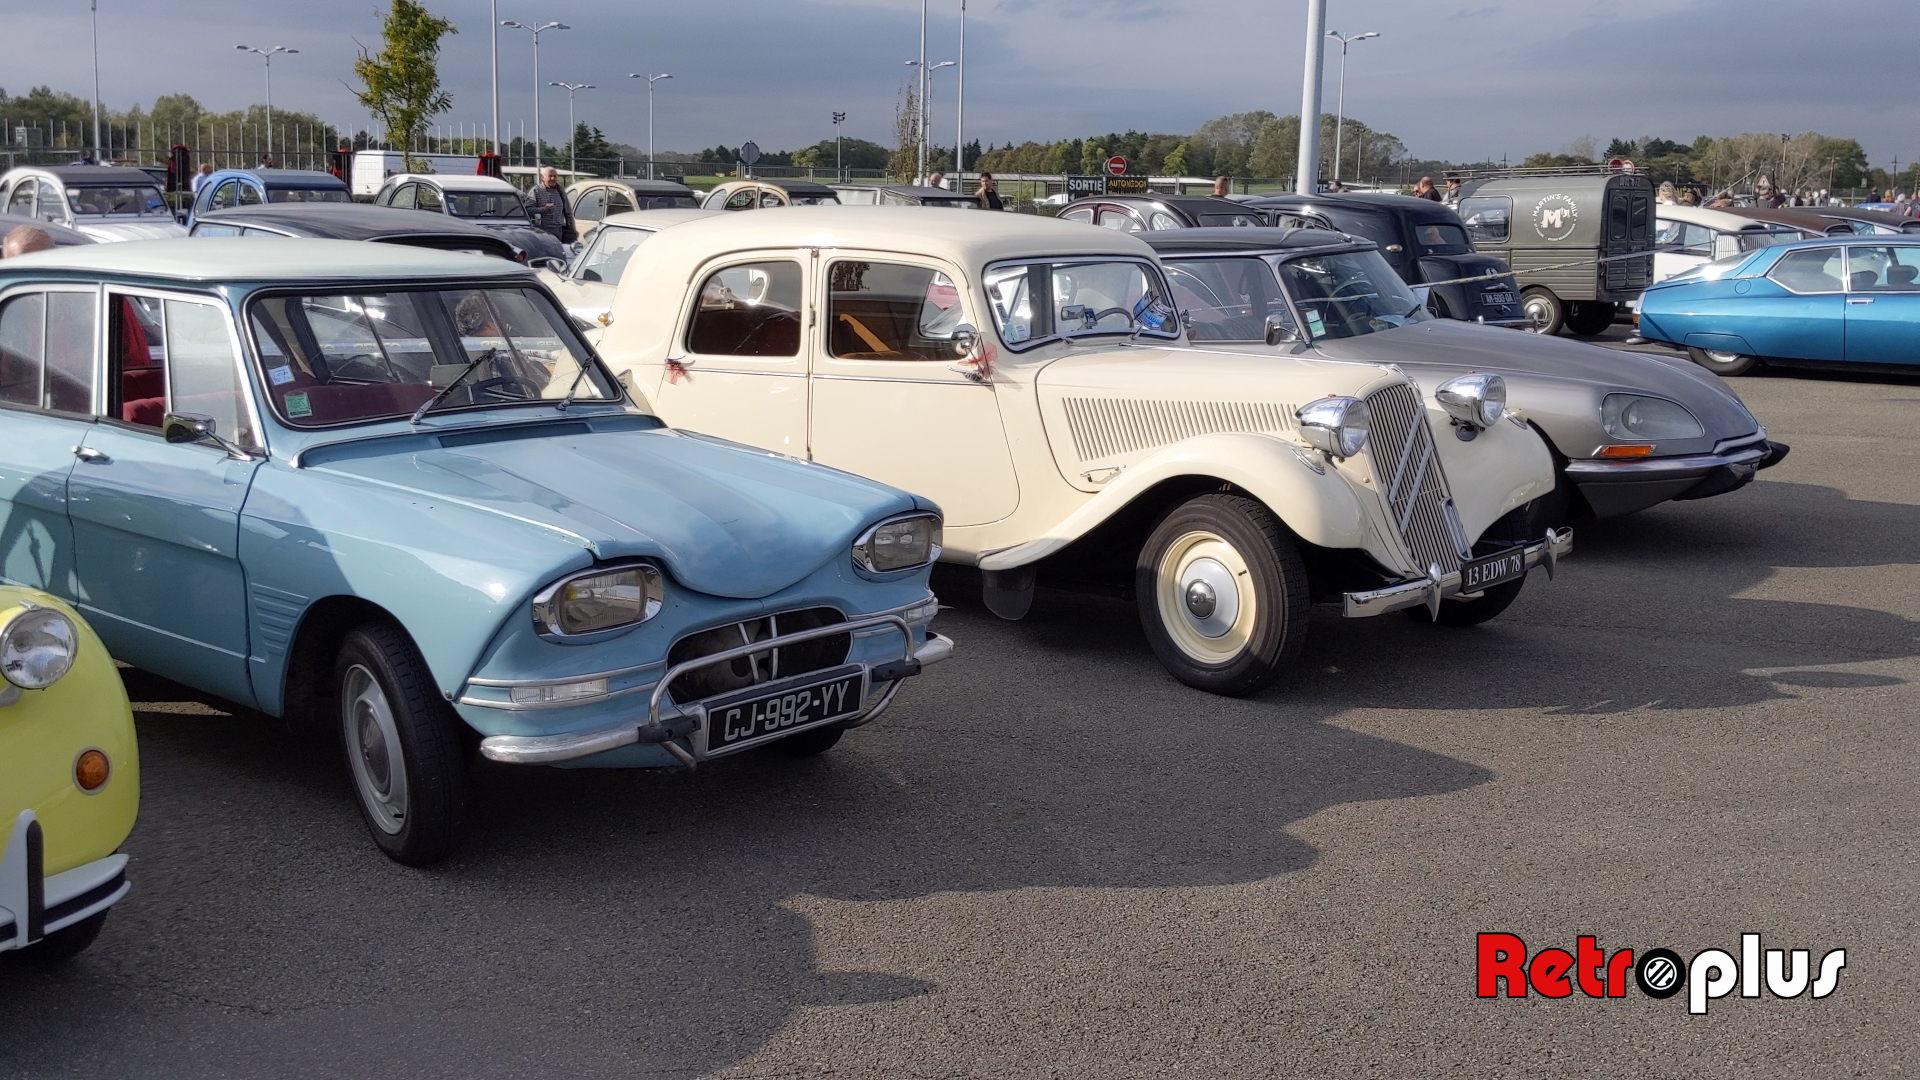 Automedon2019-parkingCitroen54